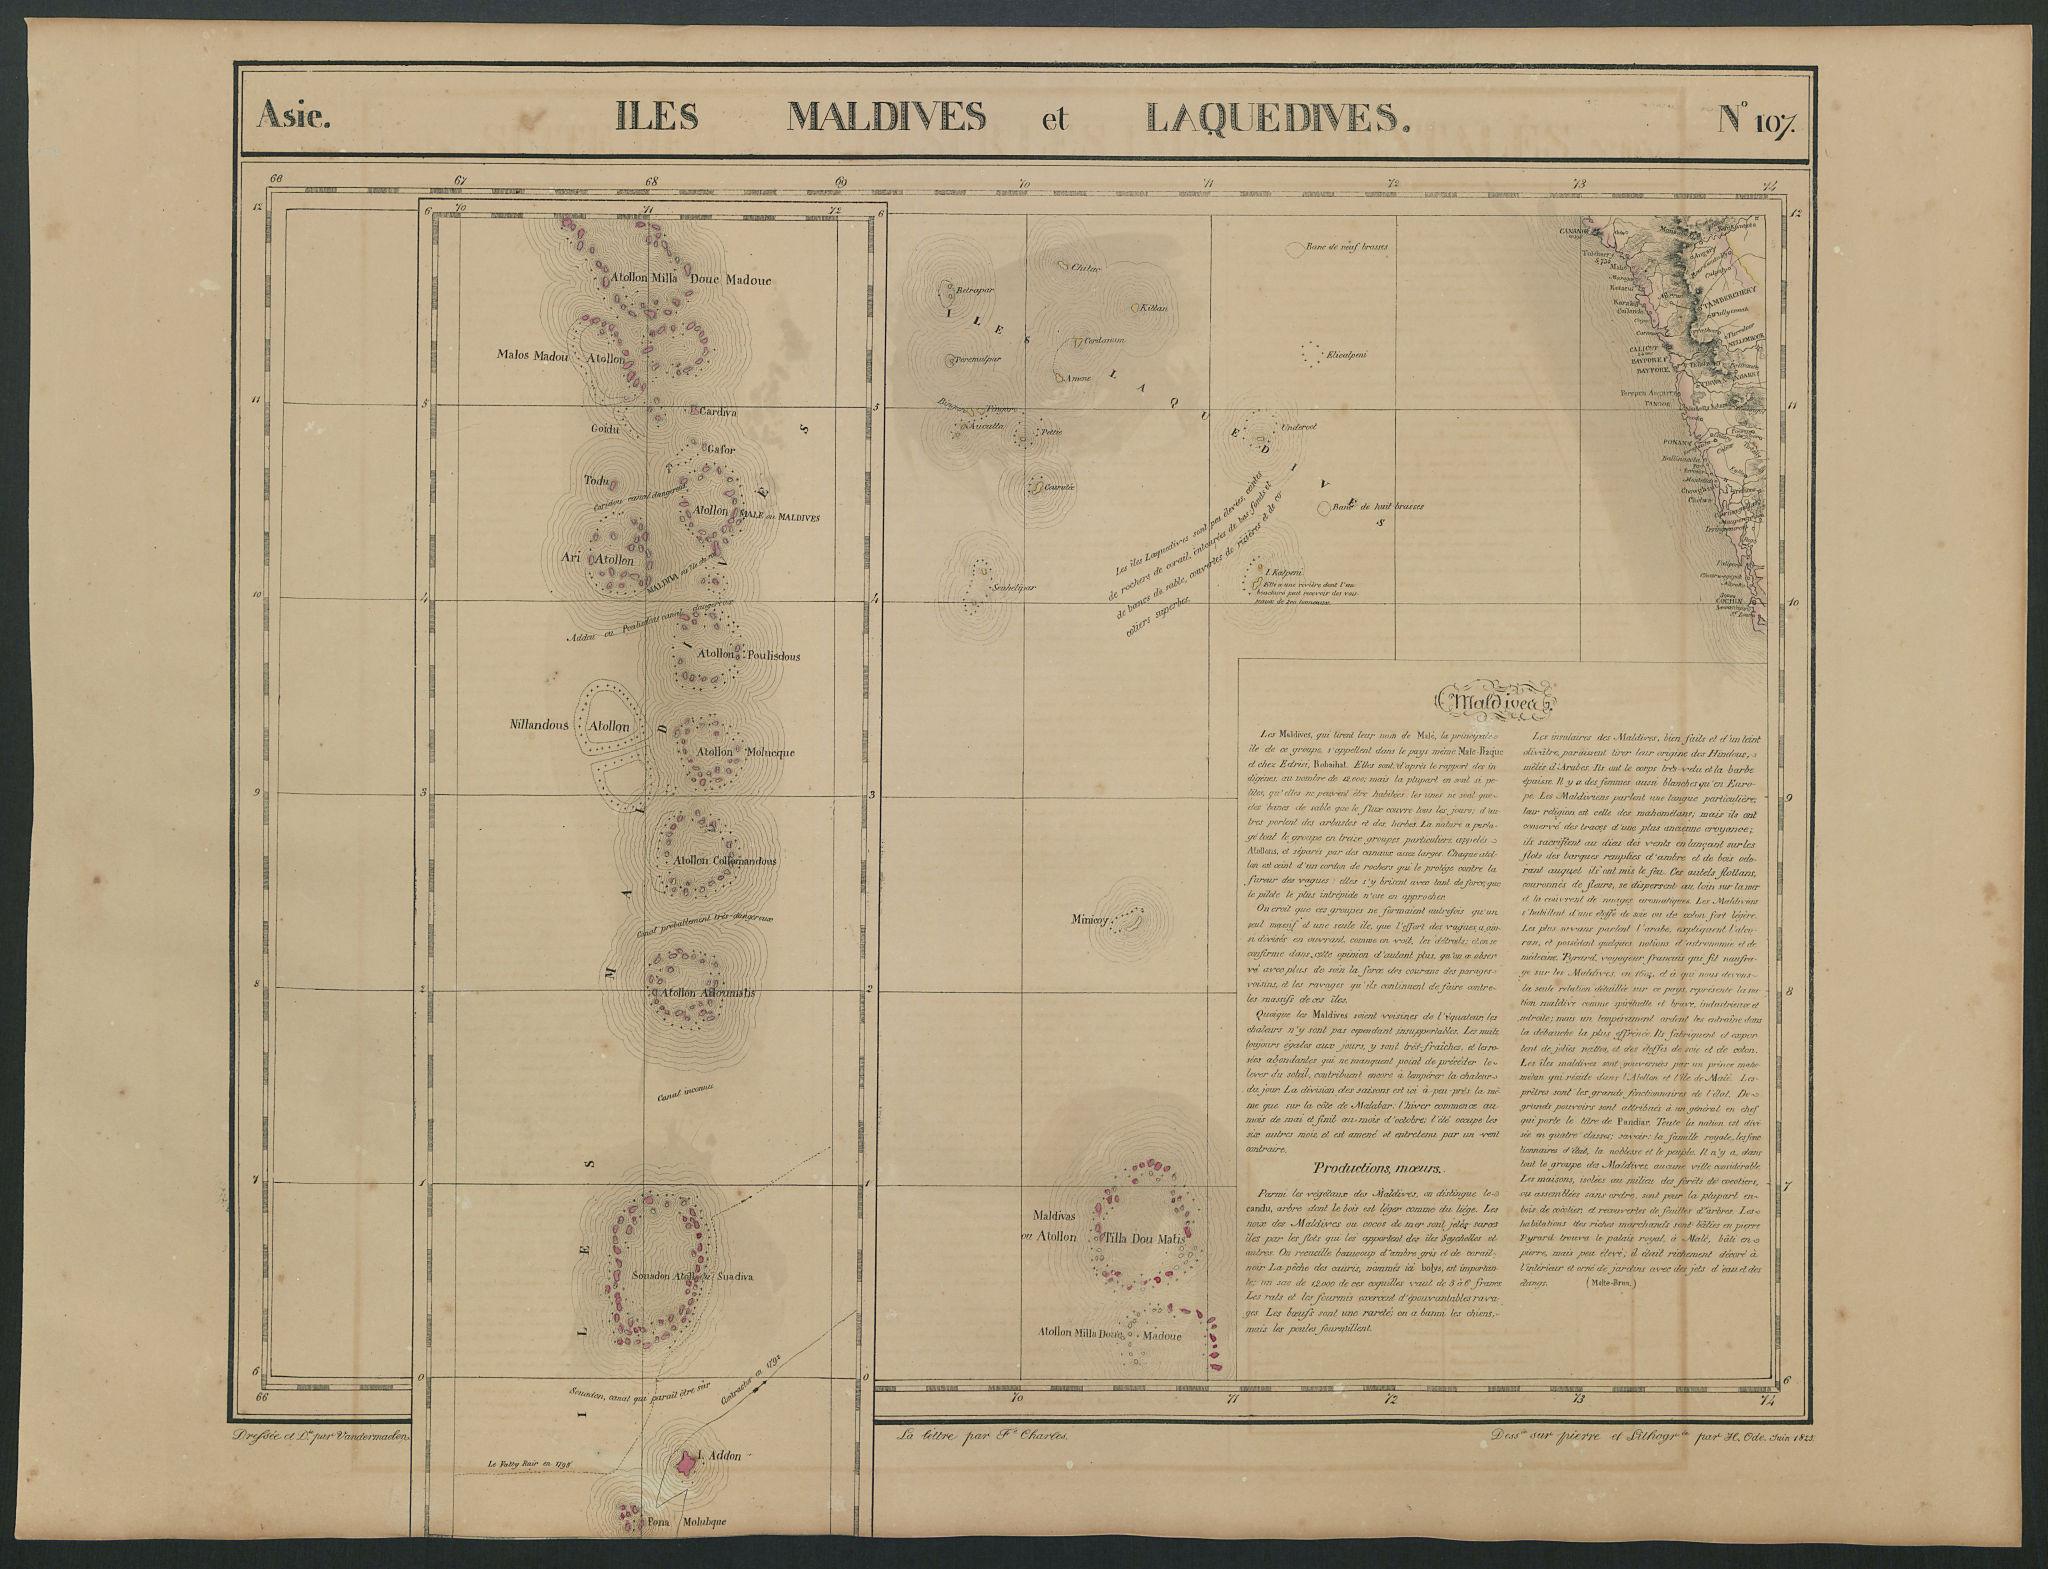 Asie. Iles Maldives Laquedives 107 India Kerala Laccadives VANDERMAELEN 1827 map